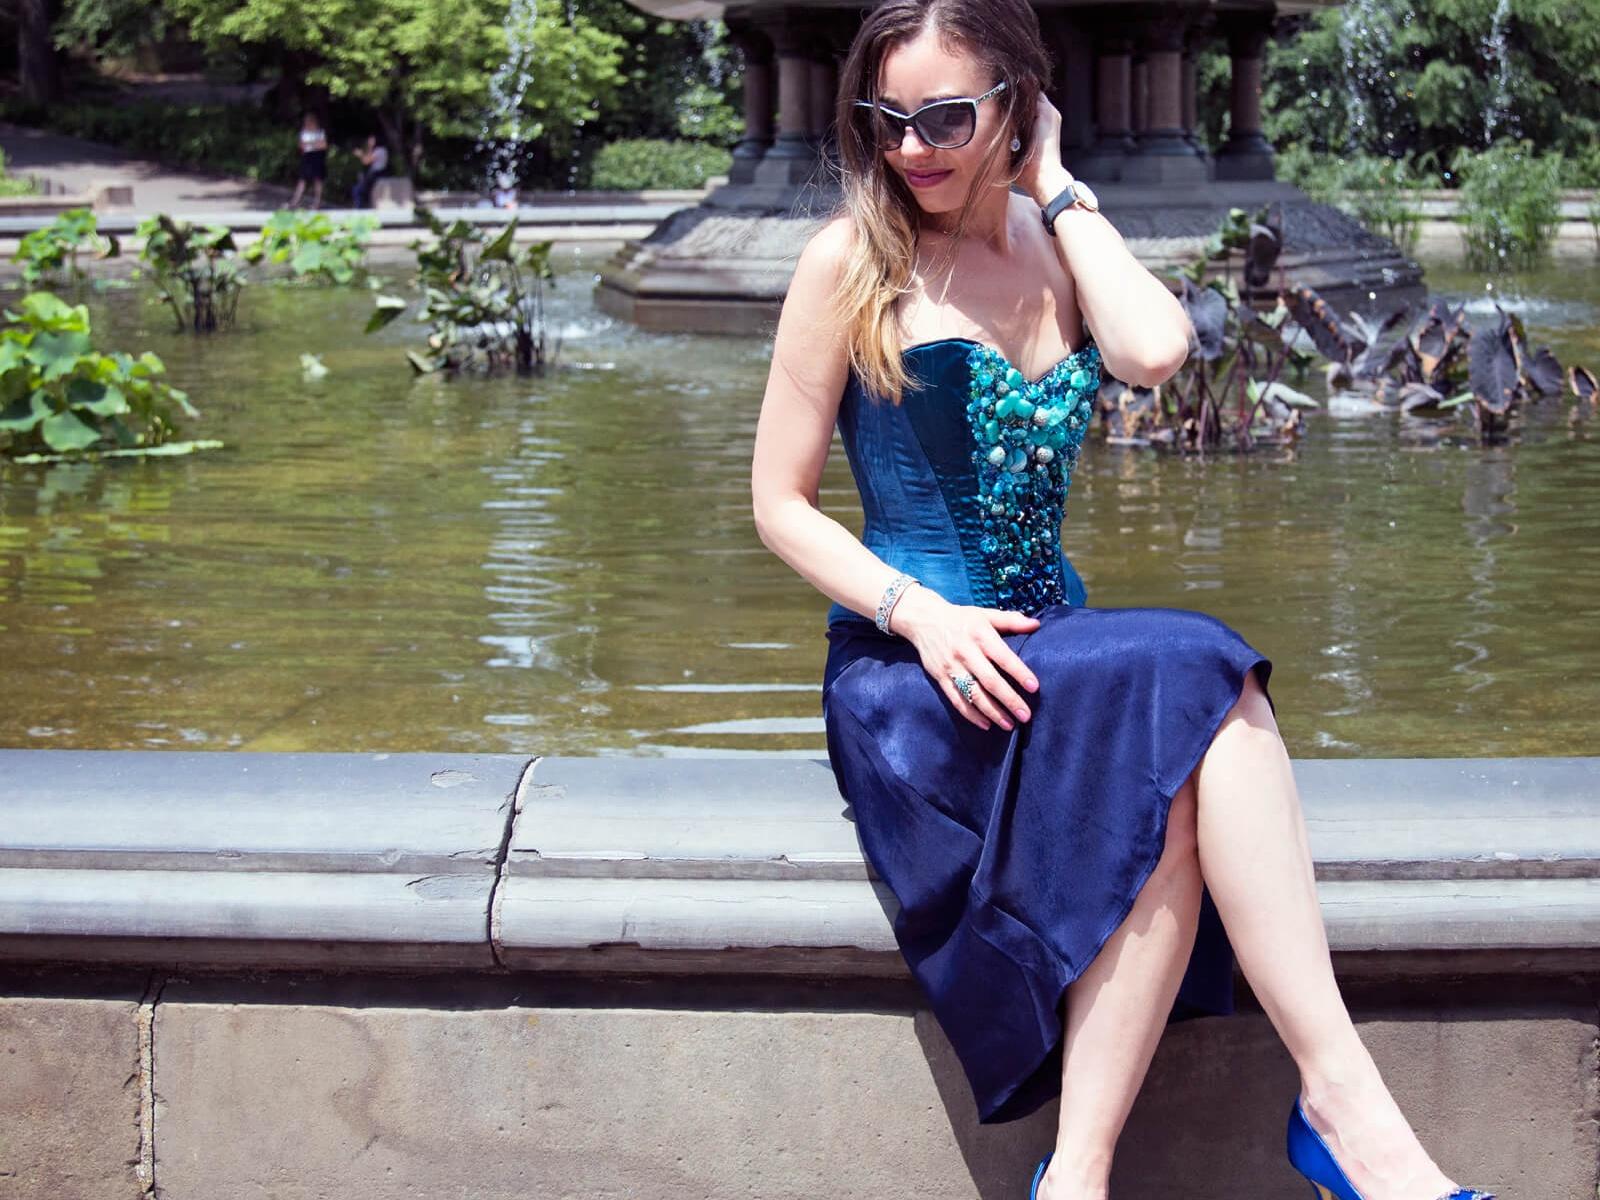 A Stroll Through Central Park